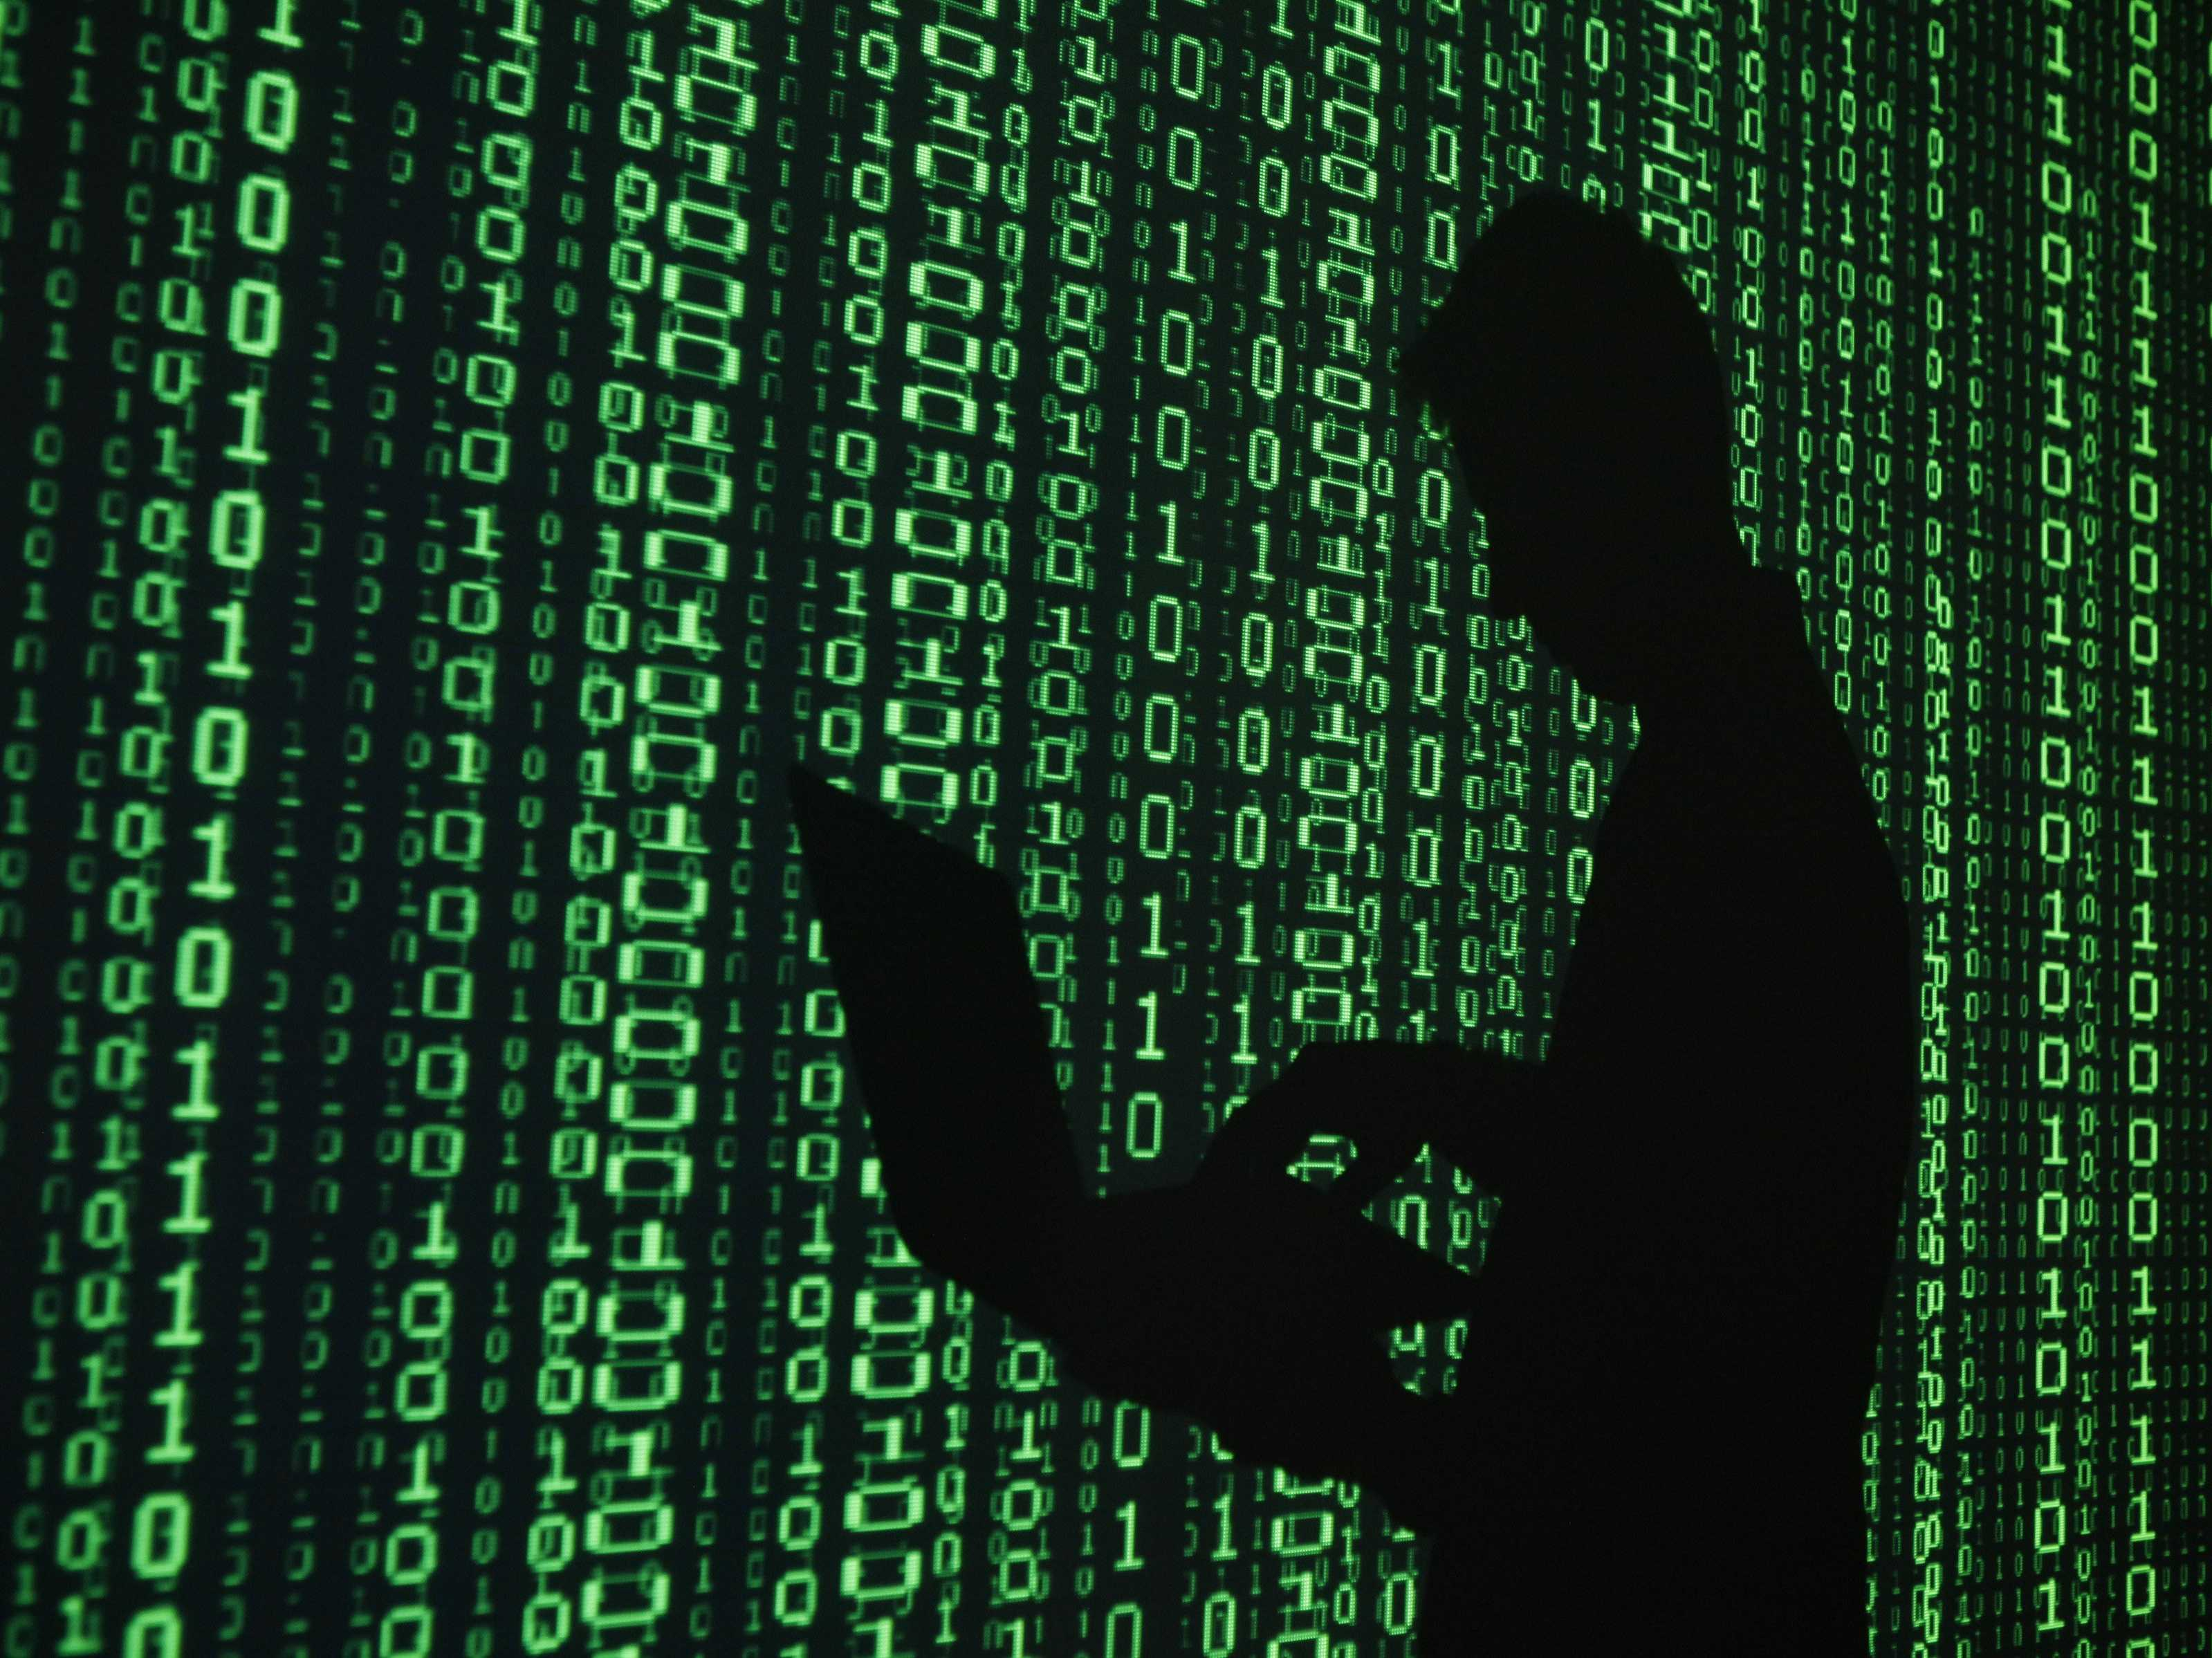 hackers costa rica election